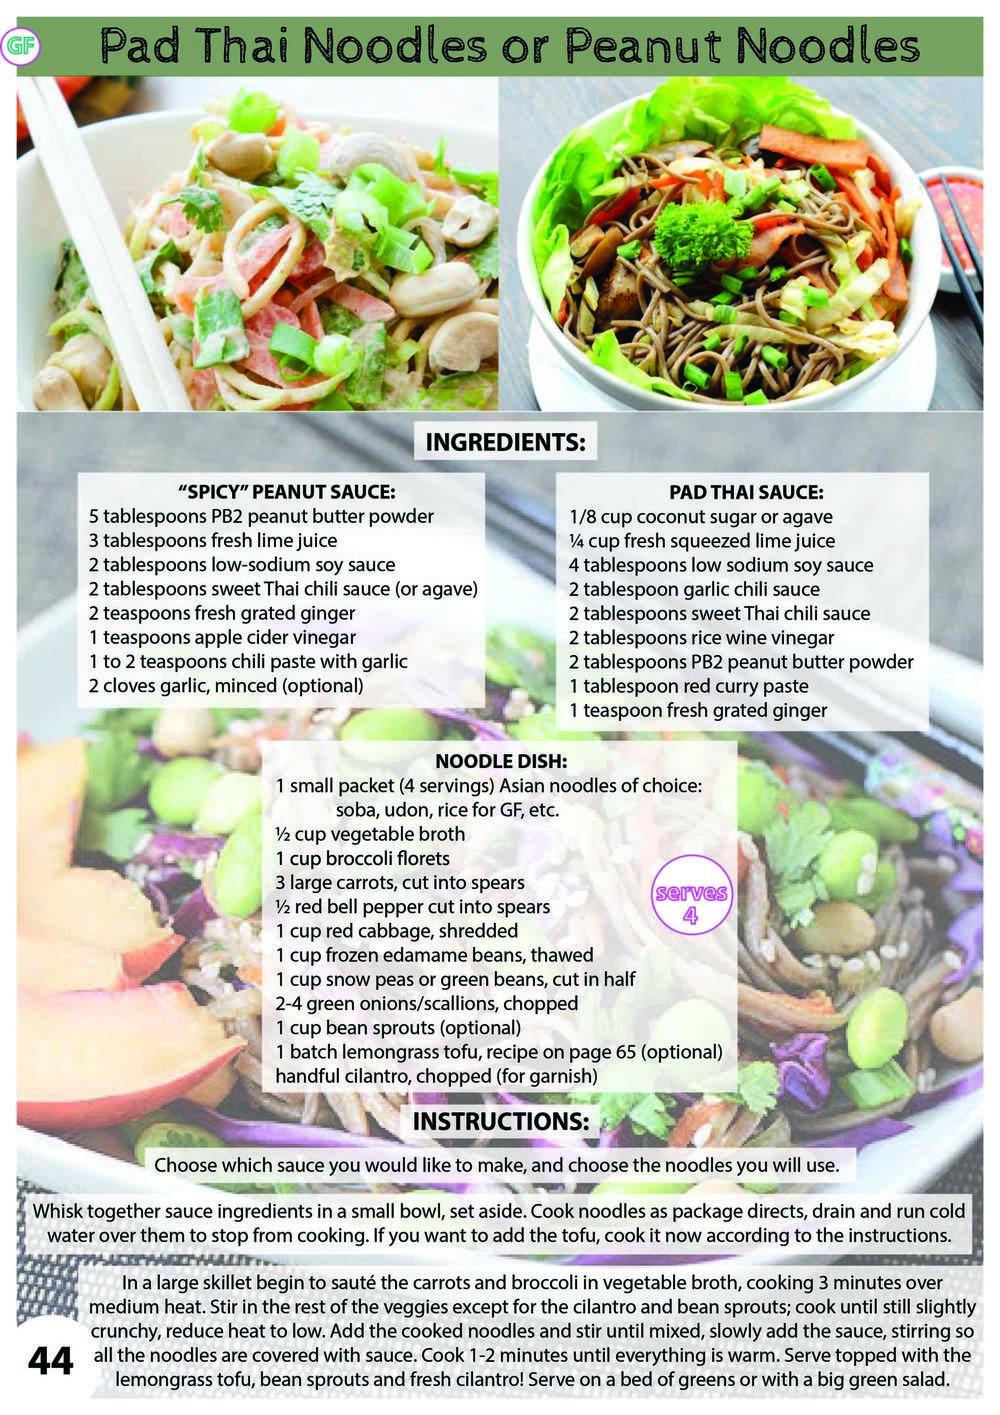 asian noodles 44.jpg